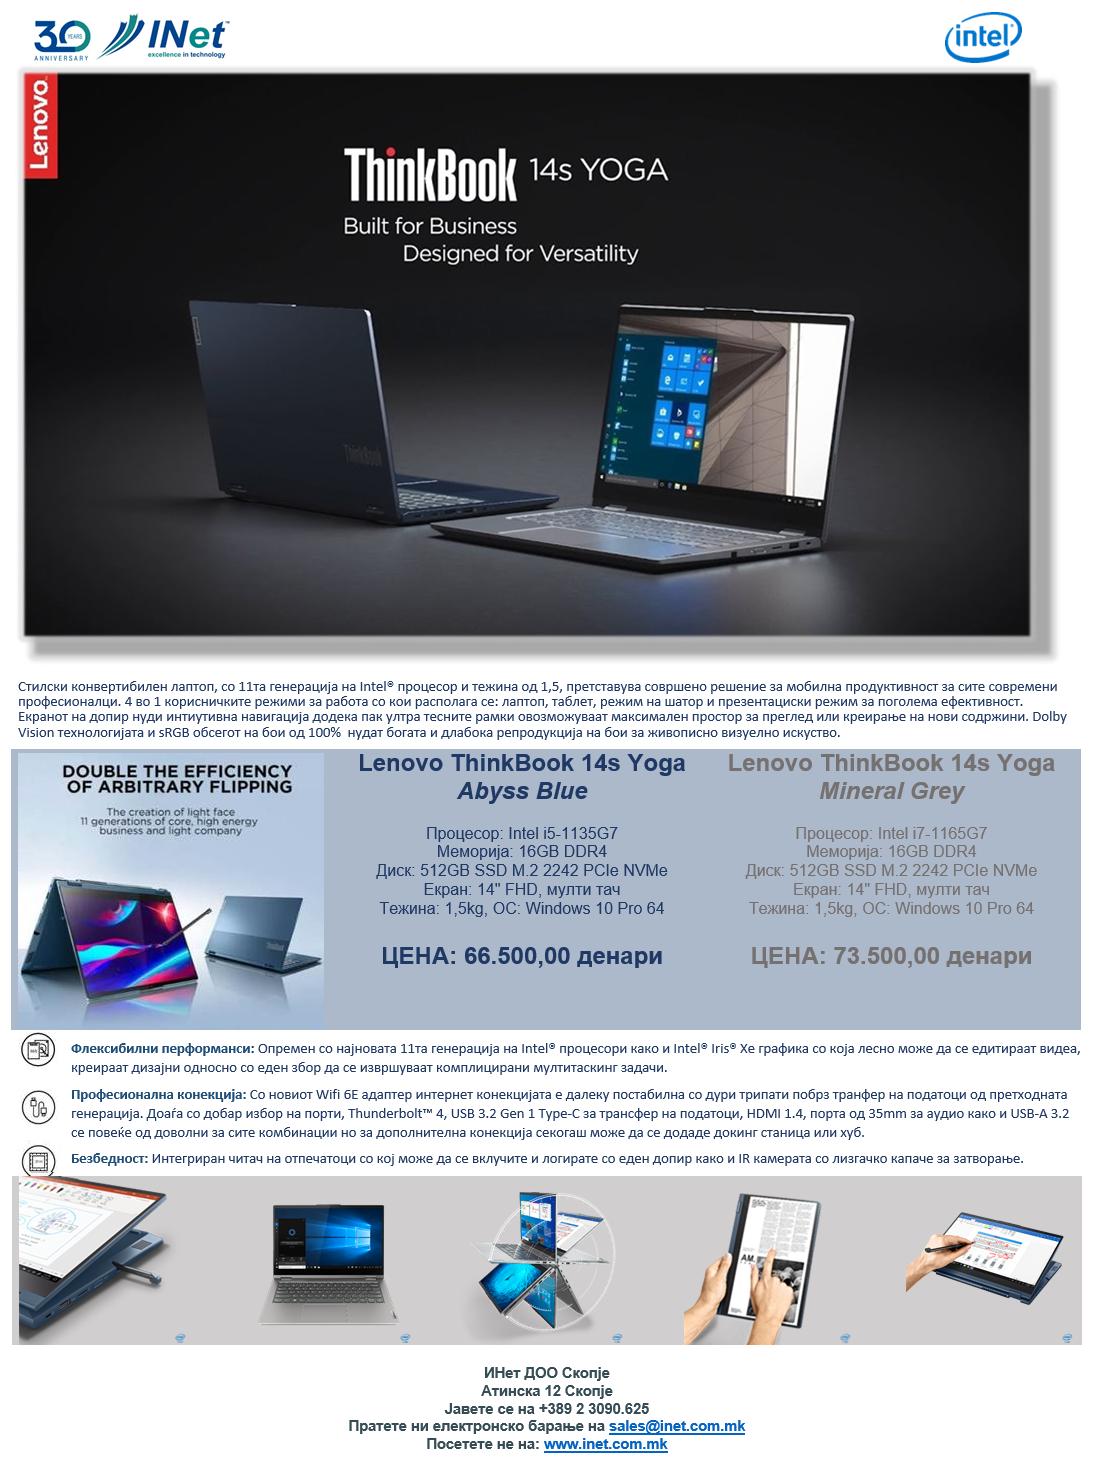 Lenovo PROMO Lenovo Thinkbook 14s Yoga - Zgolemena efikasnost so raznovidnite rezimi na rabota